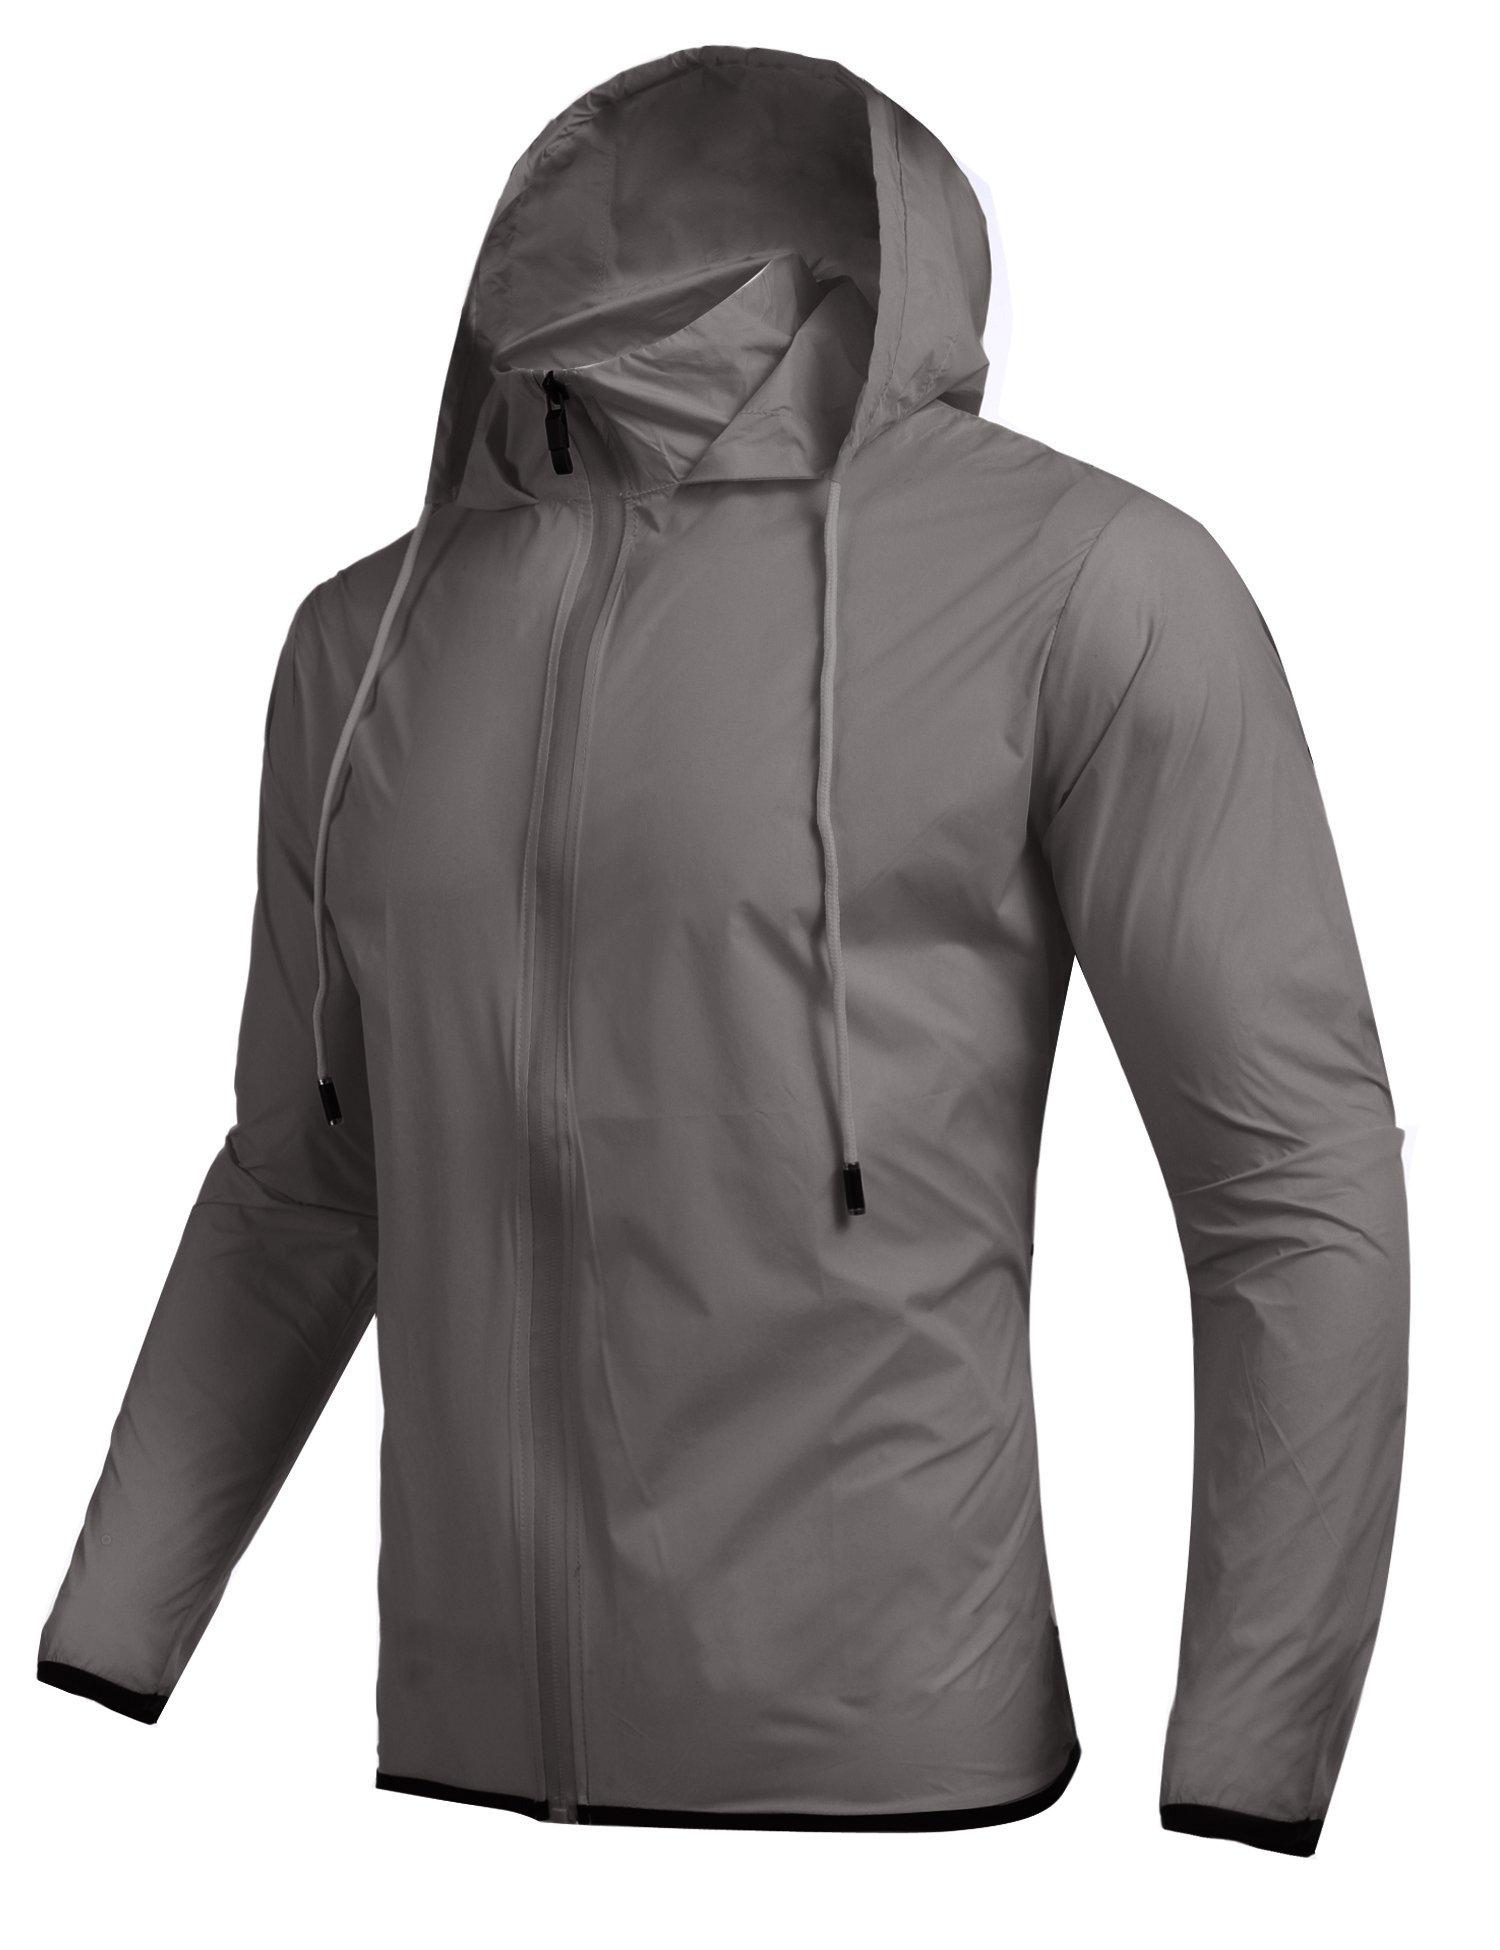 Jinidu Men's Cycling Skin Coat Jersey Bicycle Windproof Jacket Rain Coat (Medium, Light Khaki) by Jinidu (Image #3)